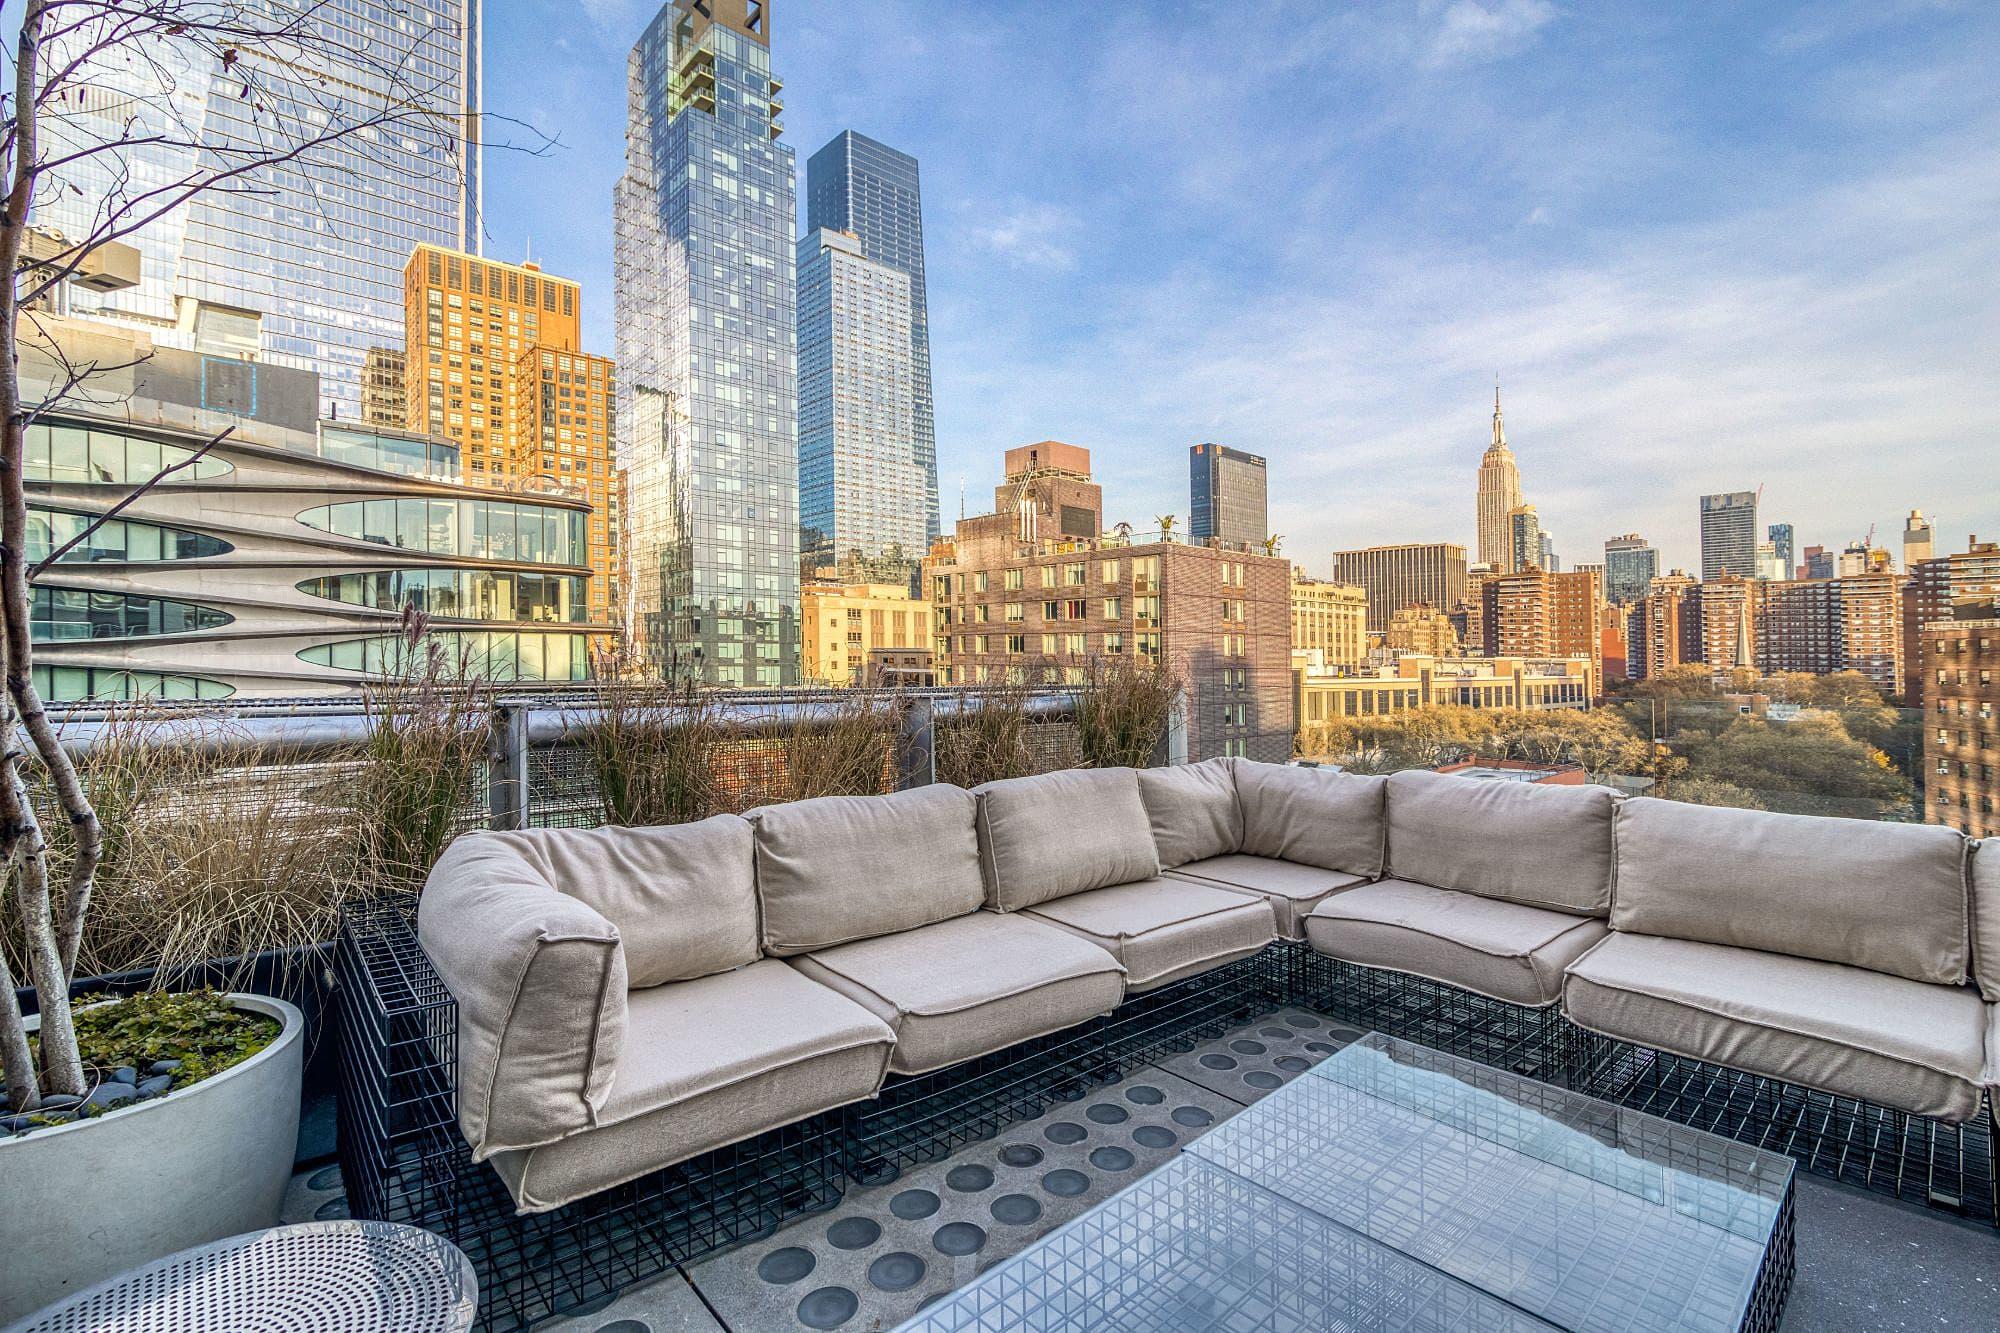 Hotel Selina Chelsea New York Selina Free Cancellation